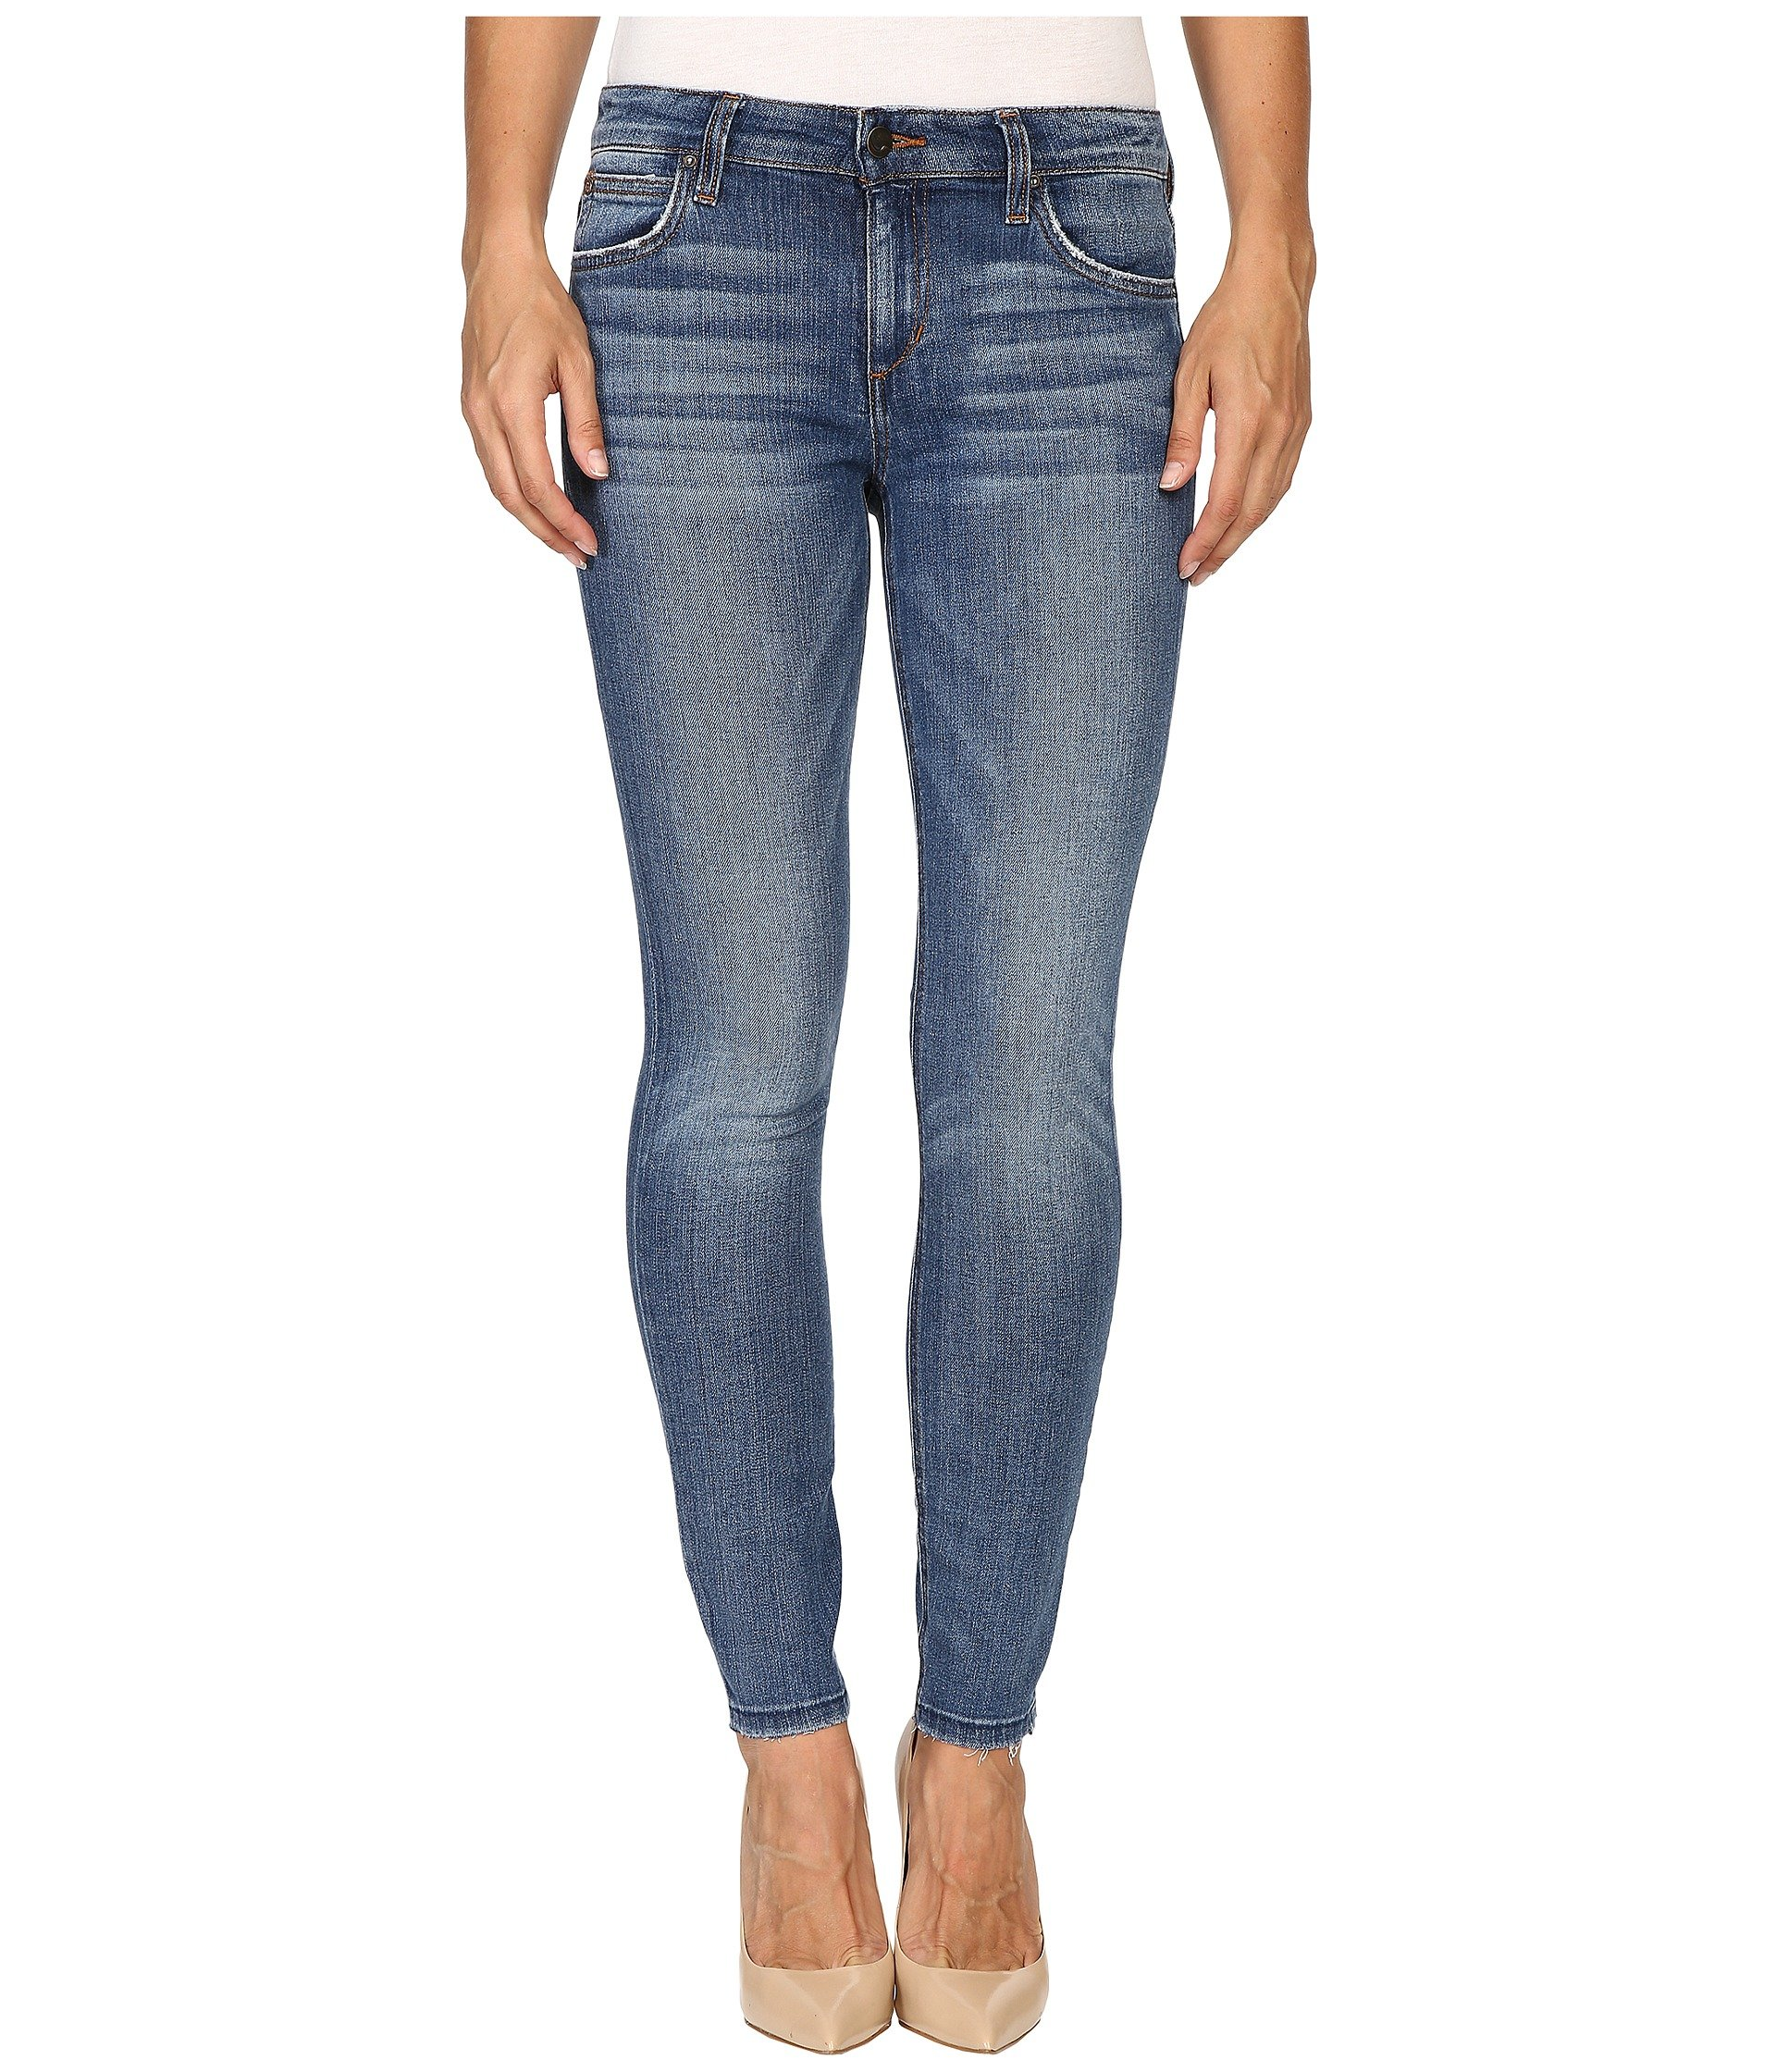 Jeans Icon Ankle L Femme Joe's JeansBleually31 W 32 The dshCxQrt